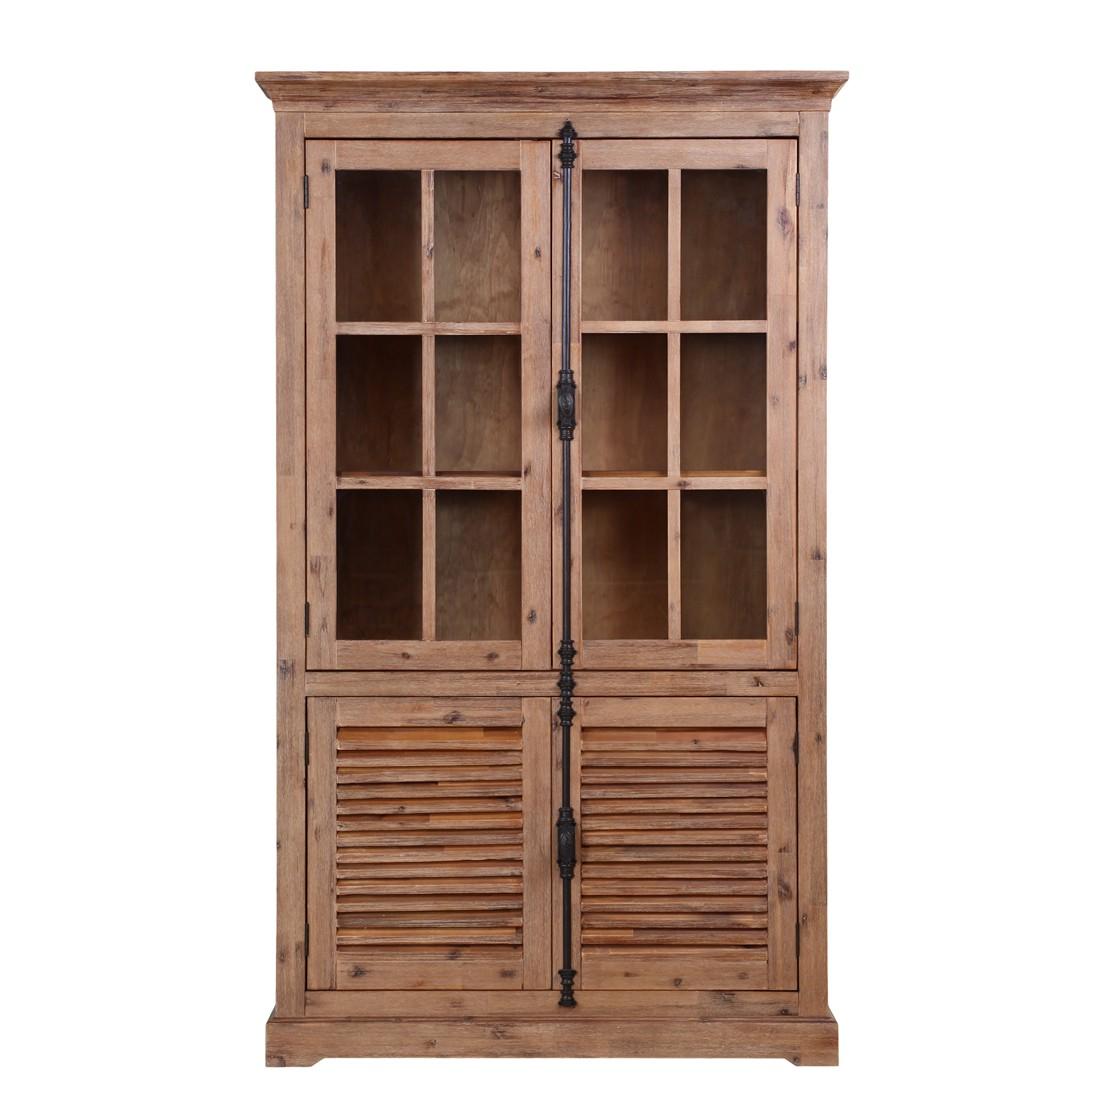 armoire vitrine le havre iii acacia massif ridgevalley. Black Bedroom Furniture Sets. Home Design Ideas